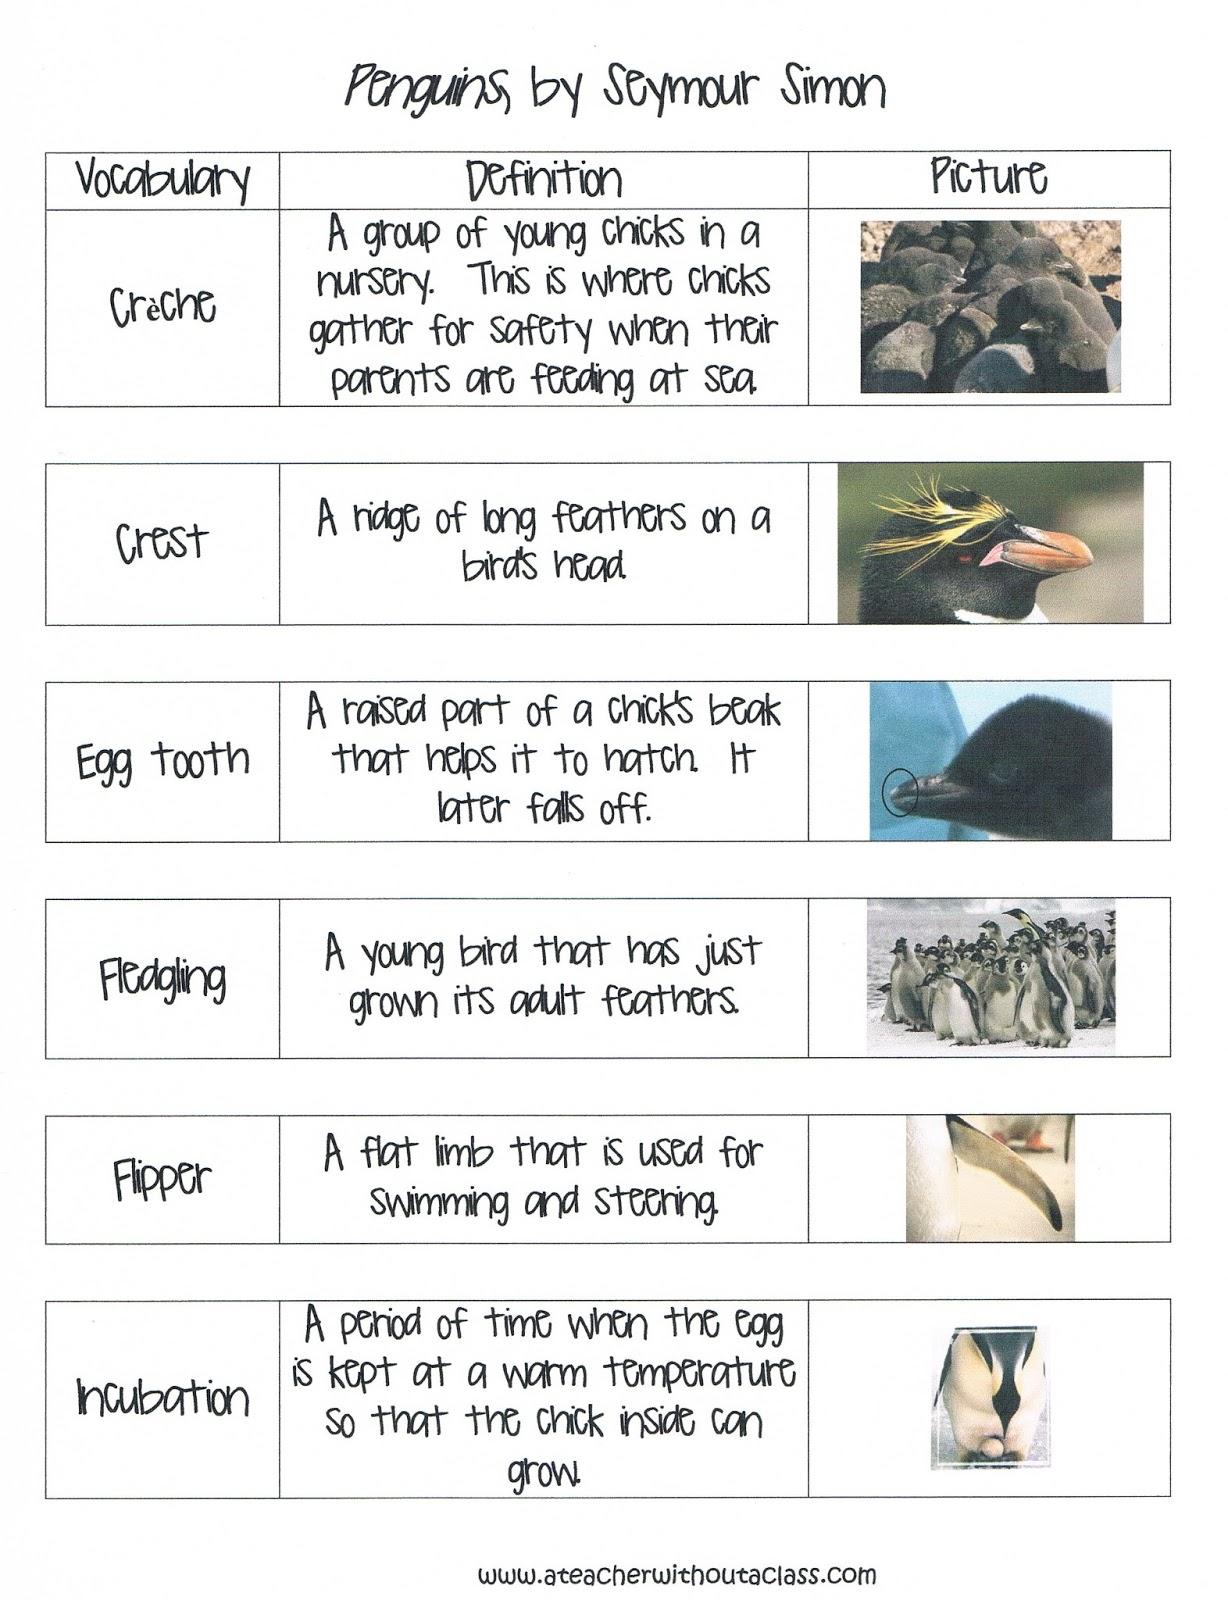 Kindergarten Vocabulary Words And Definitions